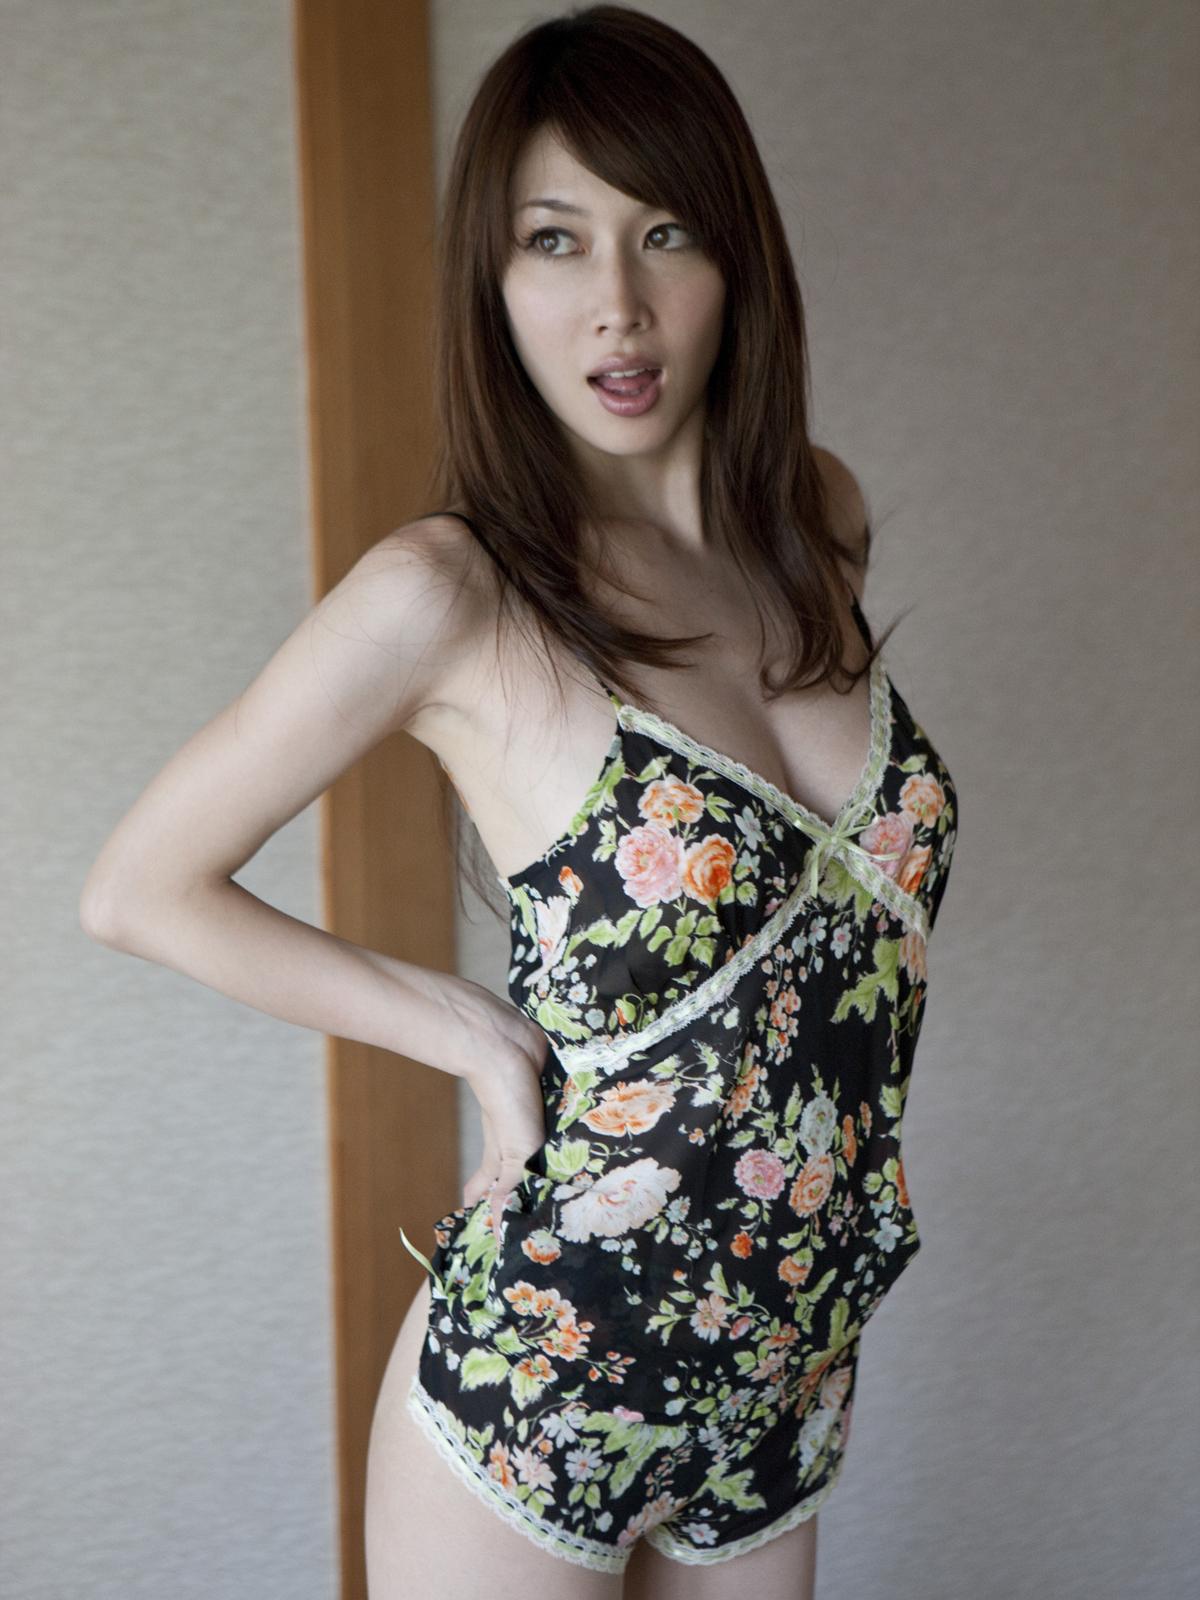 [Sabra.net] Emi Kobayashi 小林恵美『INNER FOREST 2』[80P71MB]